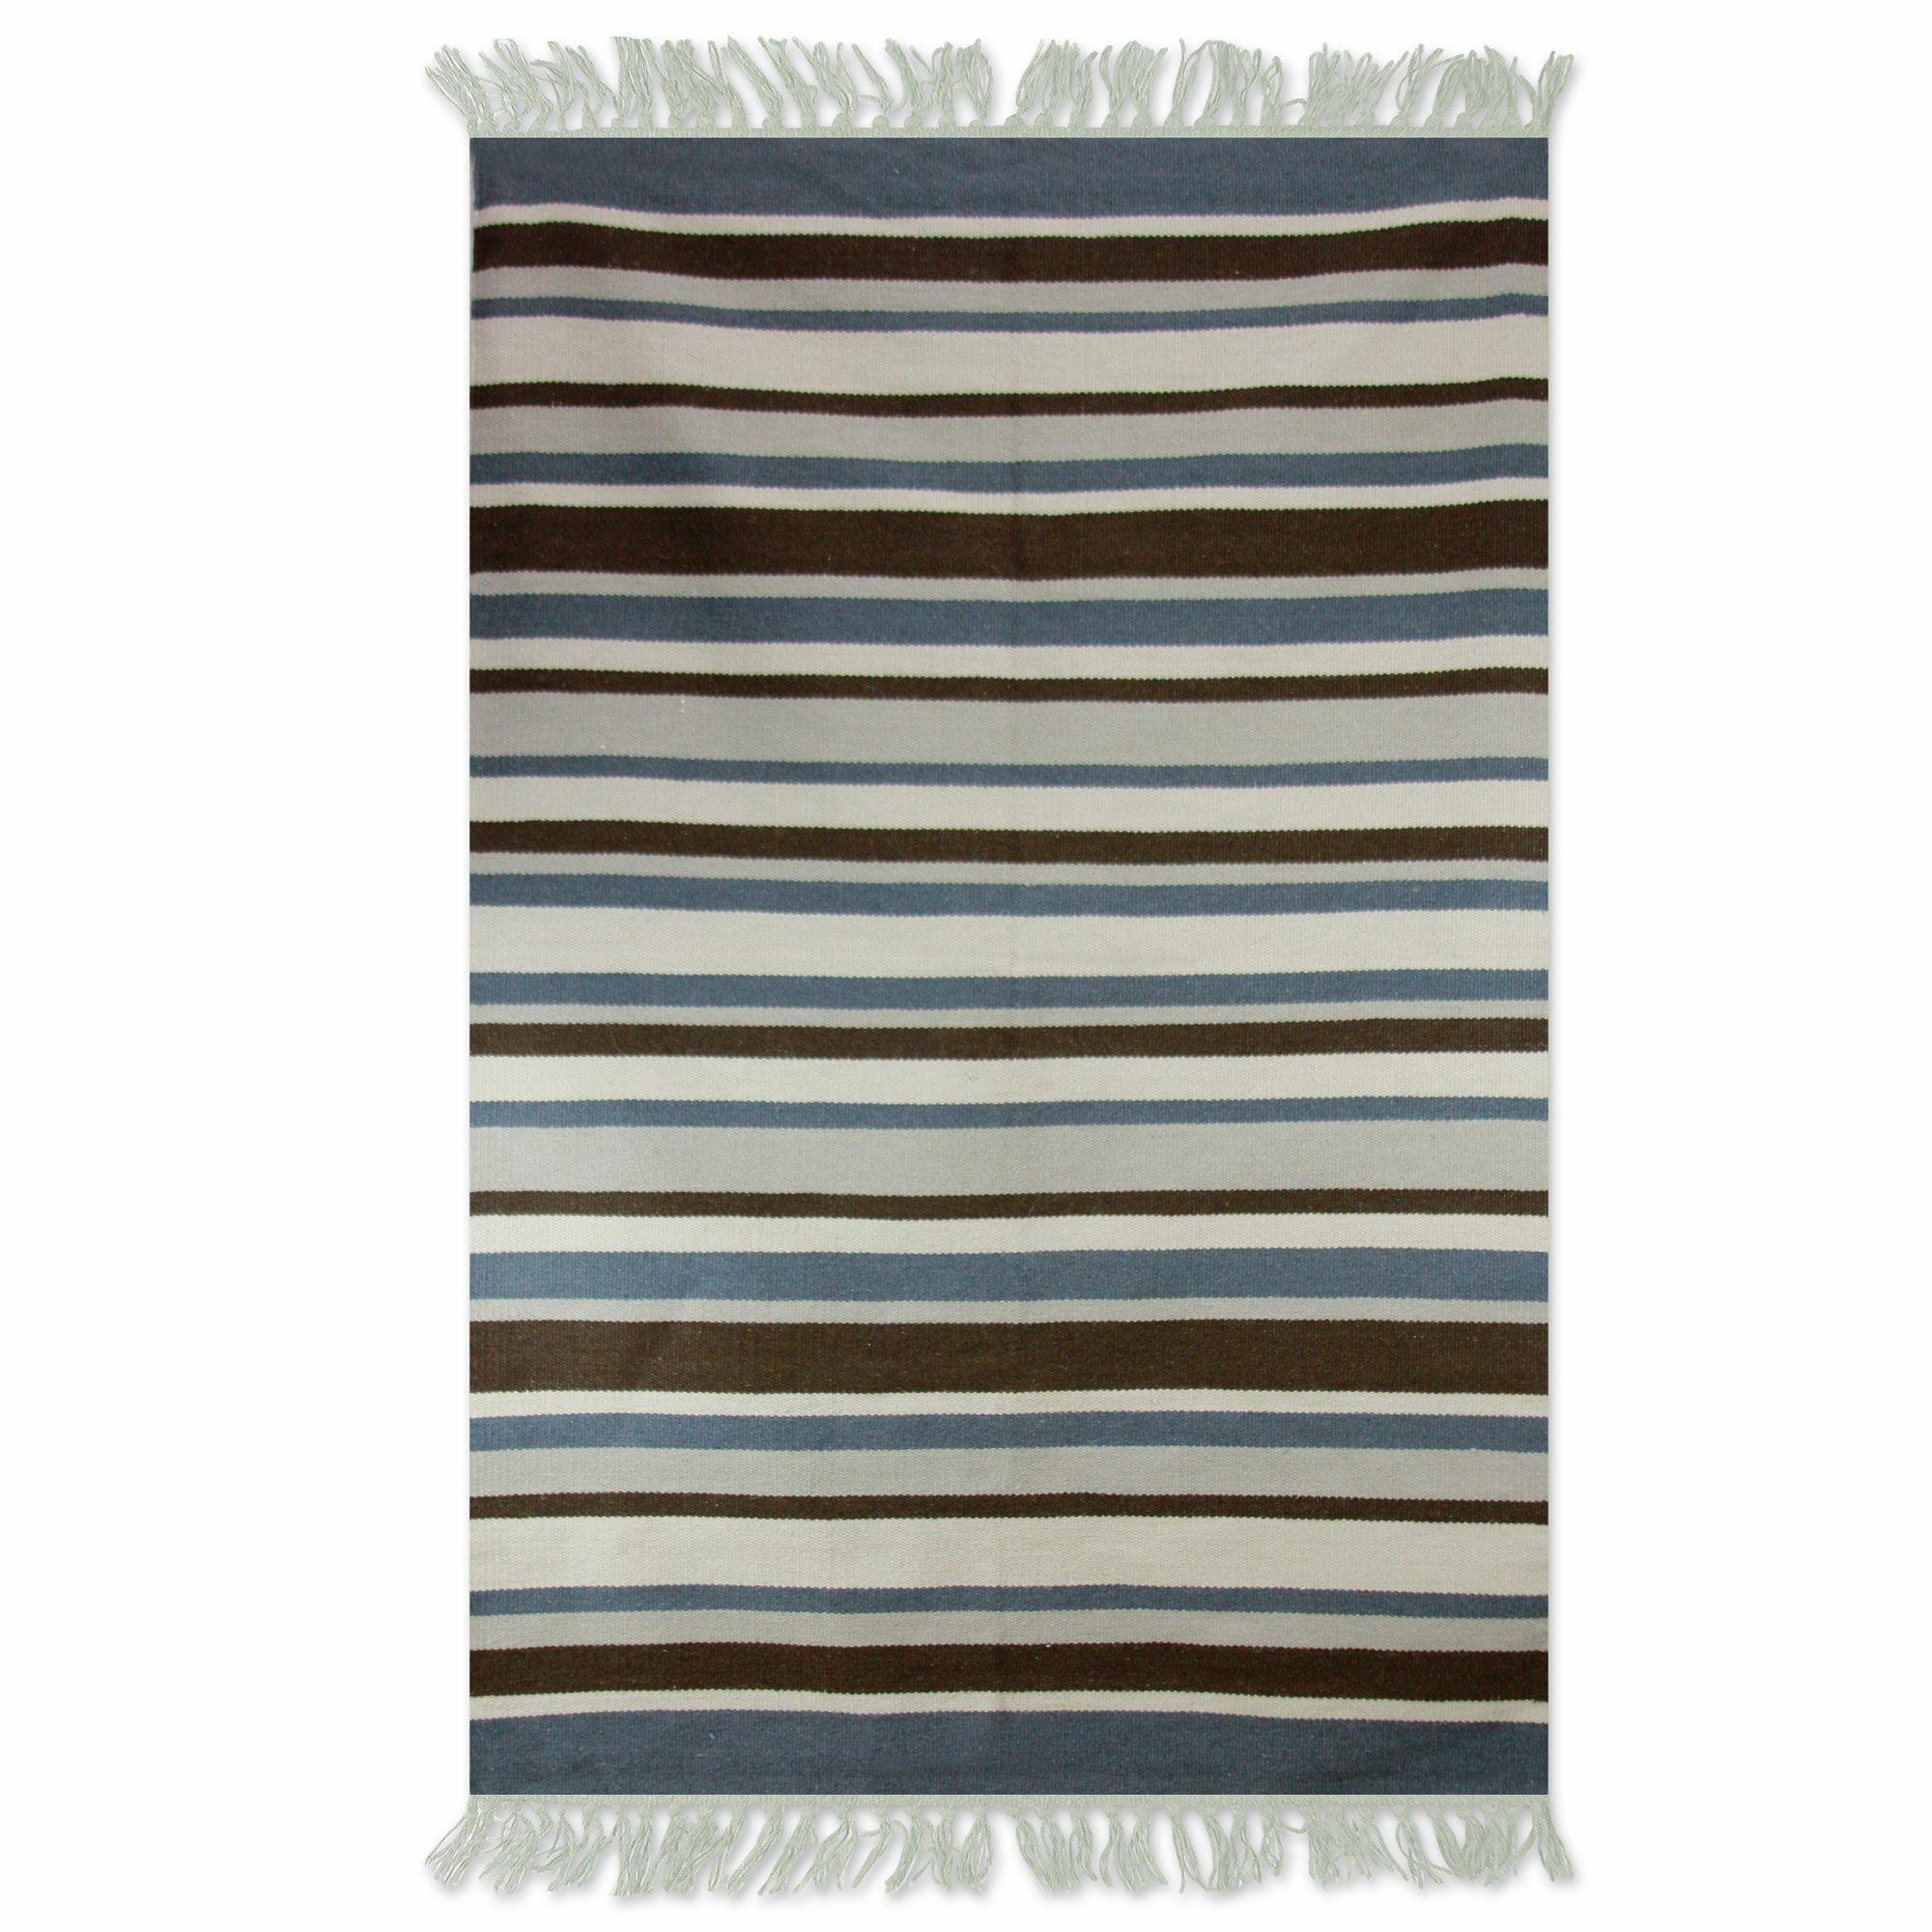 Handmade Gray/Blue Area Rug